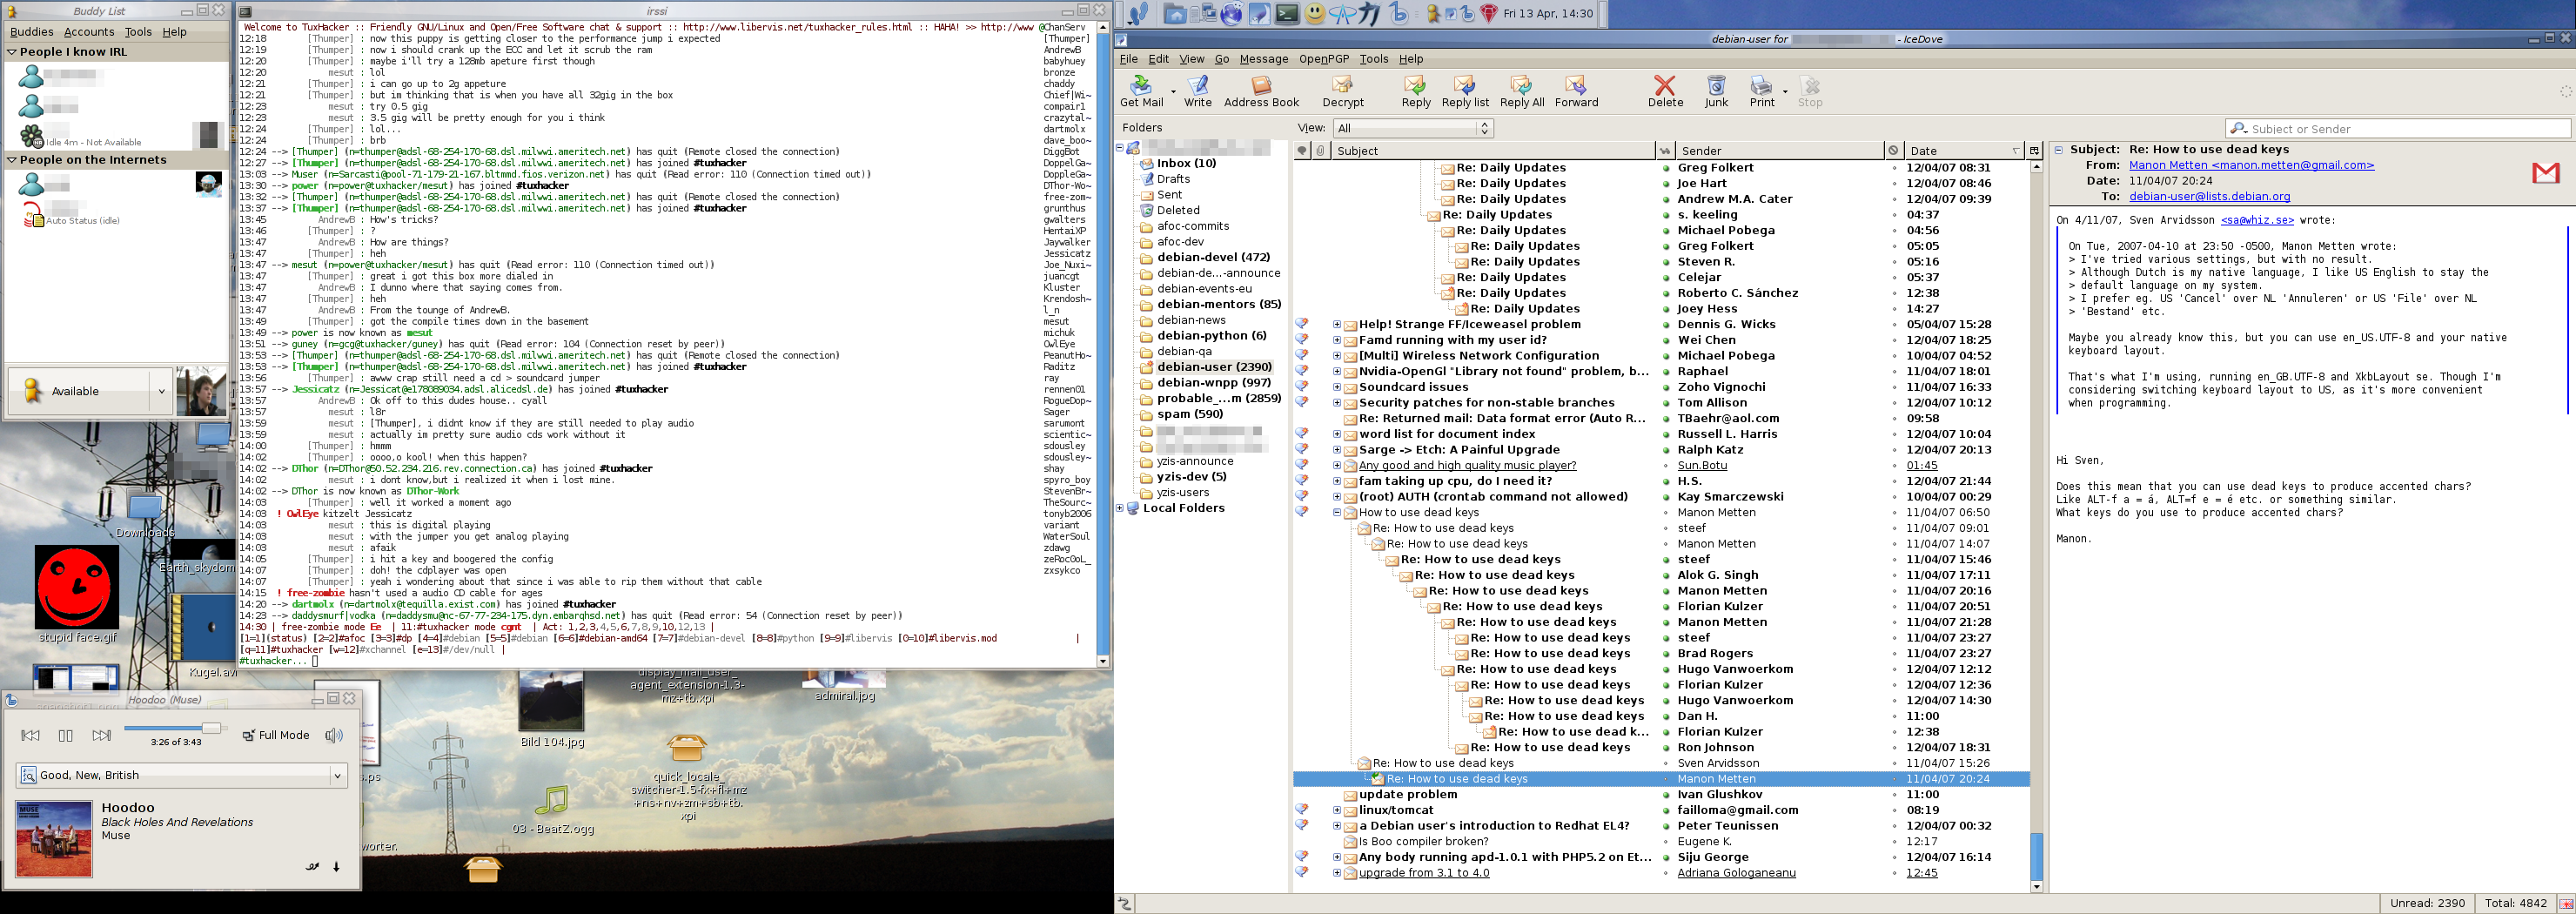 random screen shot - debian gnu/linux sid w/ gnome